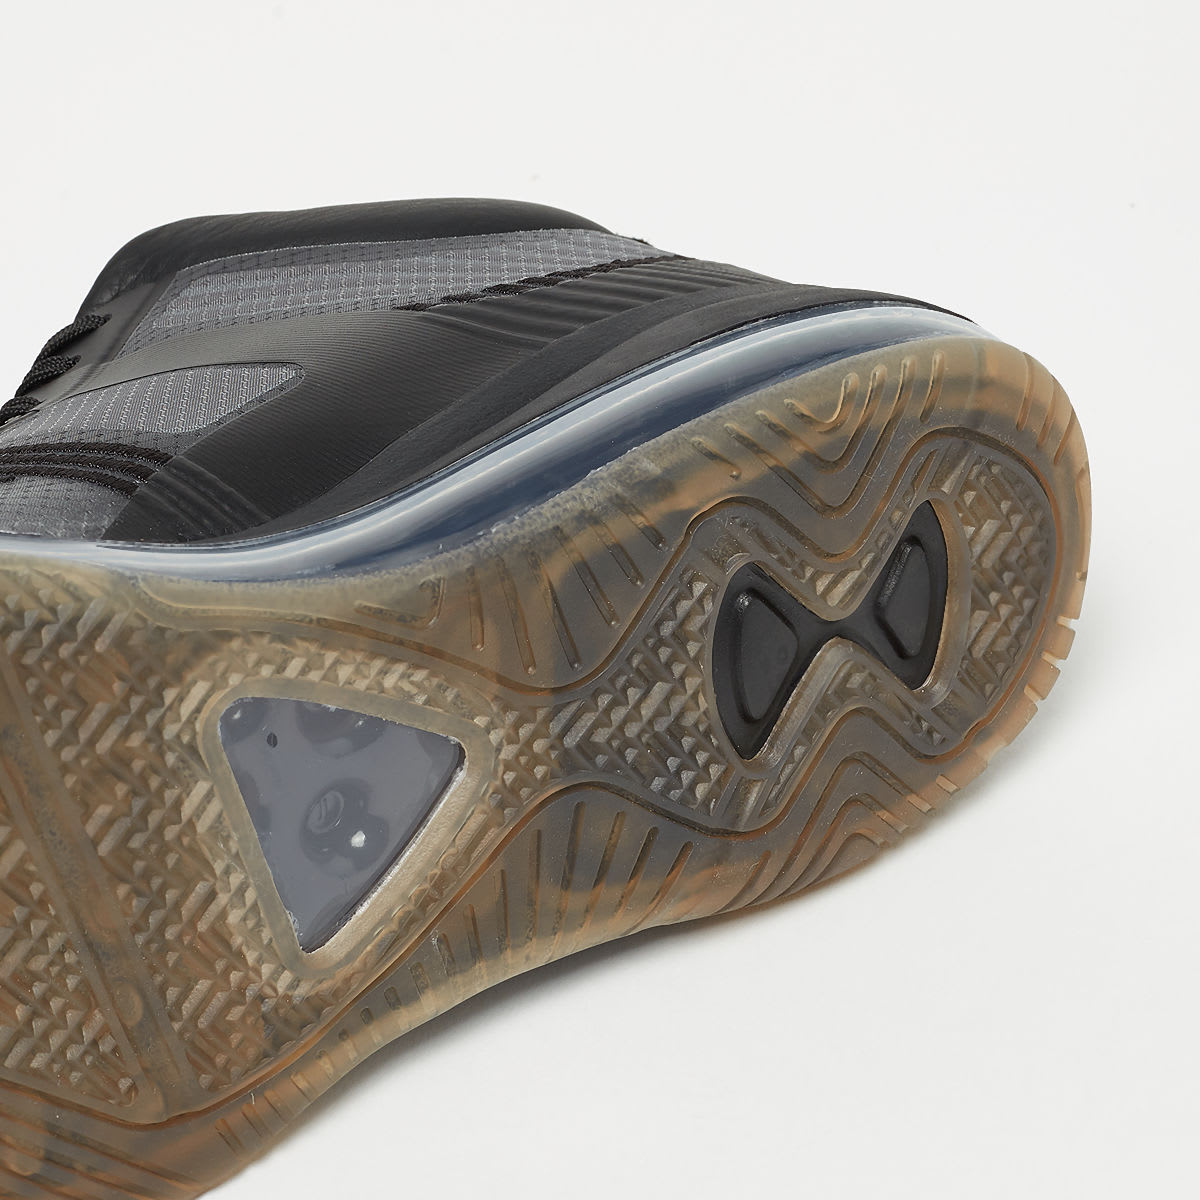 John Elliott x Nike LeBron Icon QS 'Black/Gum' AQ0114-001 (Bottom)